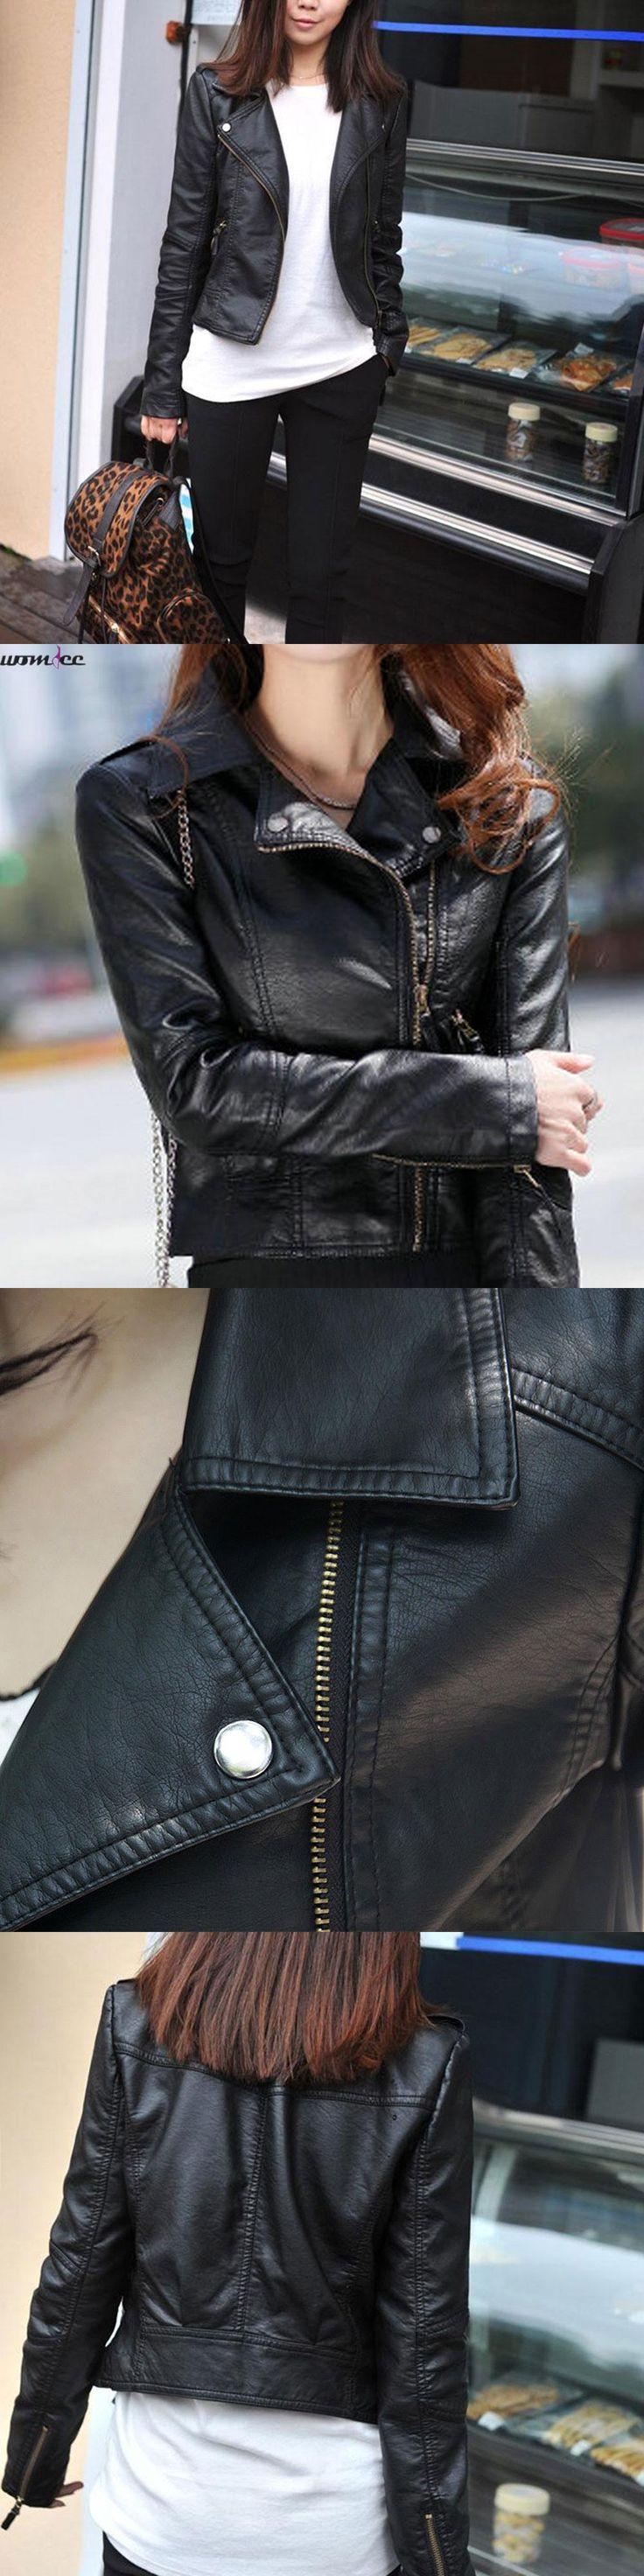 Leather Jacket Women Spring Rivet Zipper Slim Motorcycle Faux Female Leather Jackets  Paragraph Lapel PU Women Leather Jacket